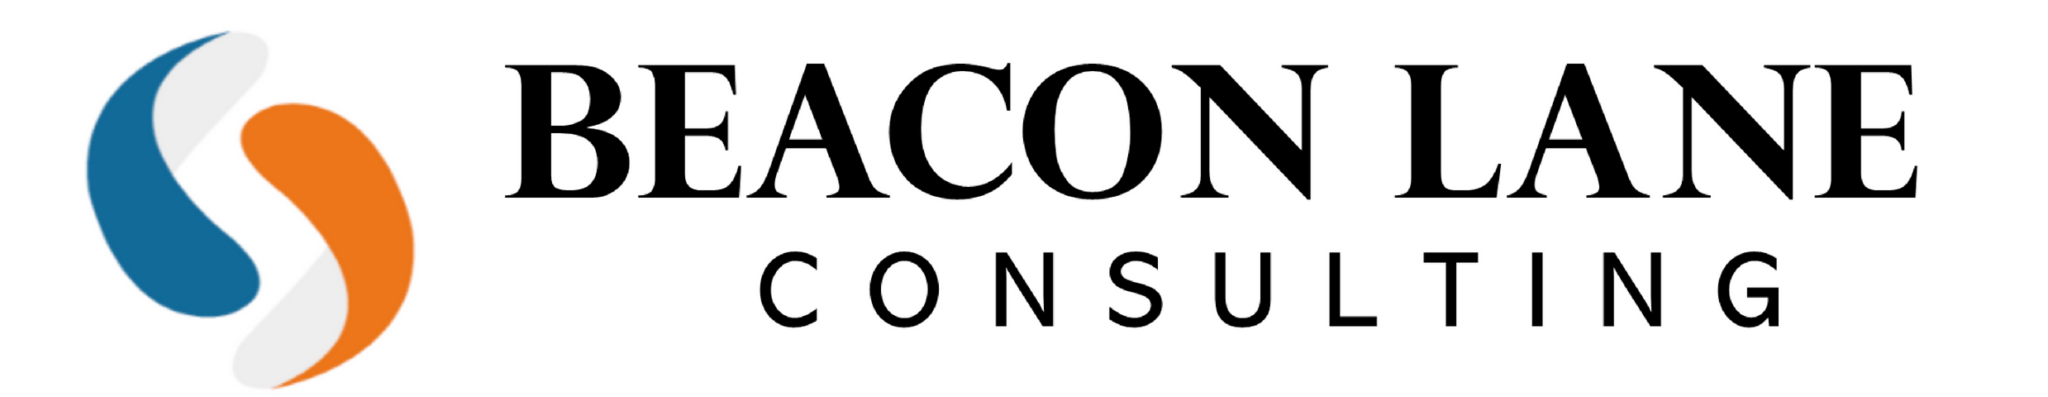 Beacon Lane Consulting